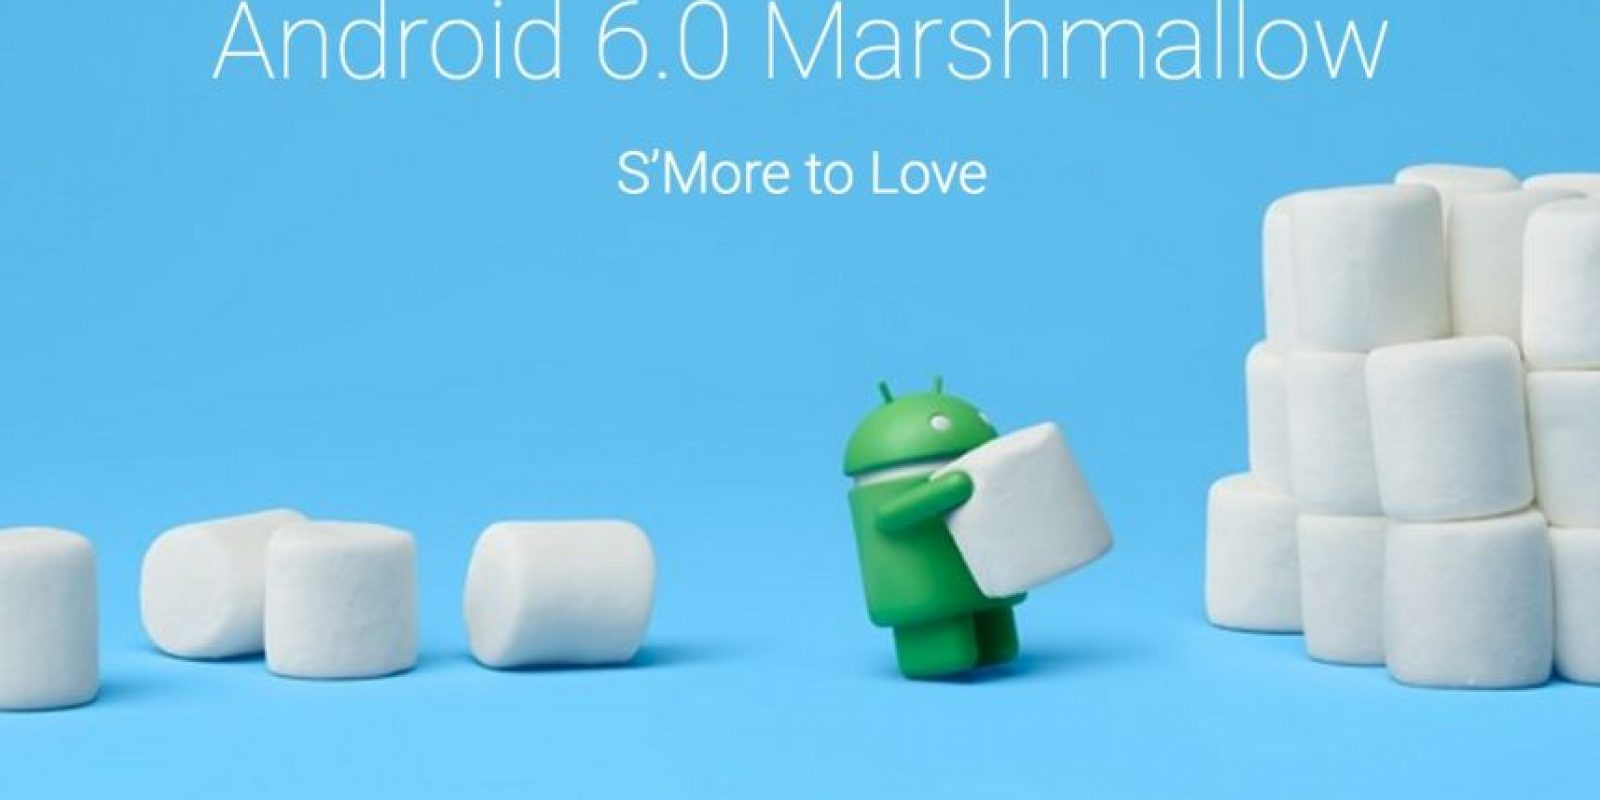 Android 6.0 Marshmallow Foto:Google